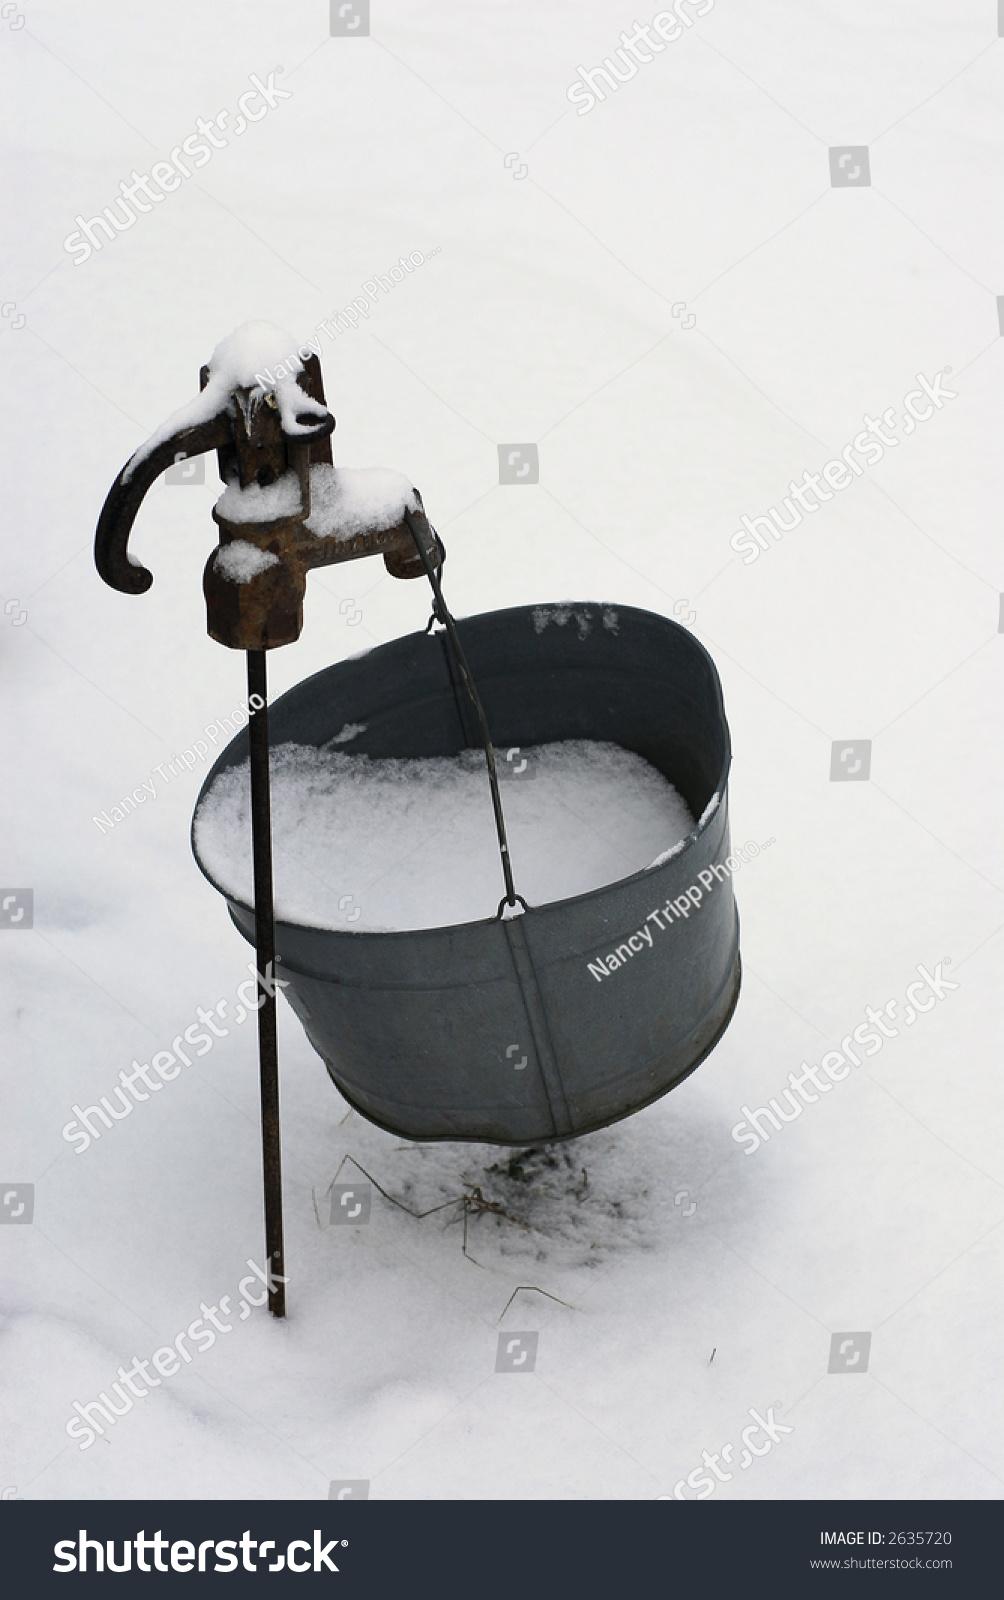 Antique Spigot Bucket Snow Hanging Over Stock Photo & Image (Royalty ...